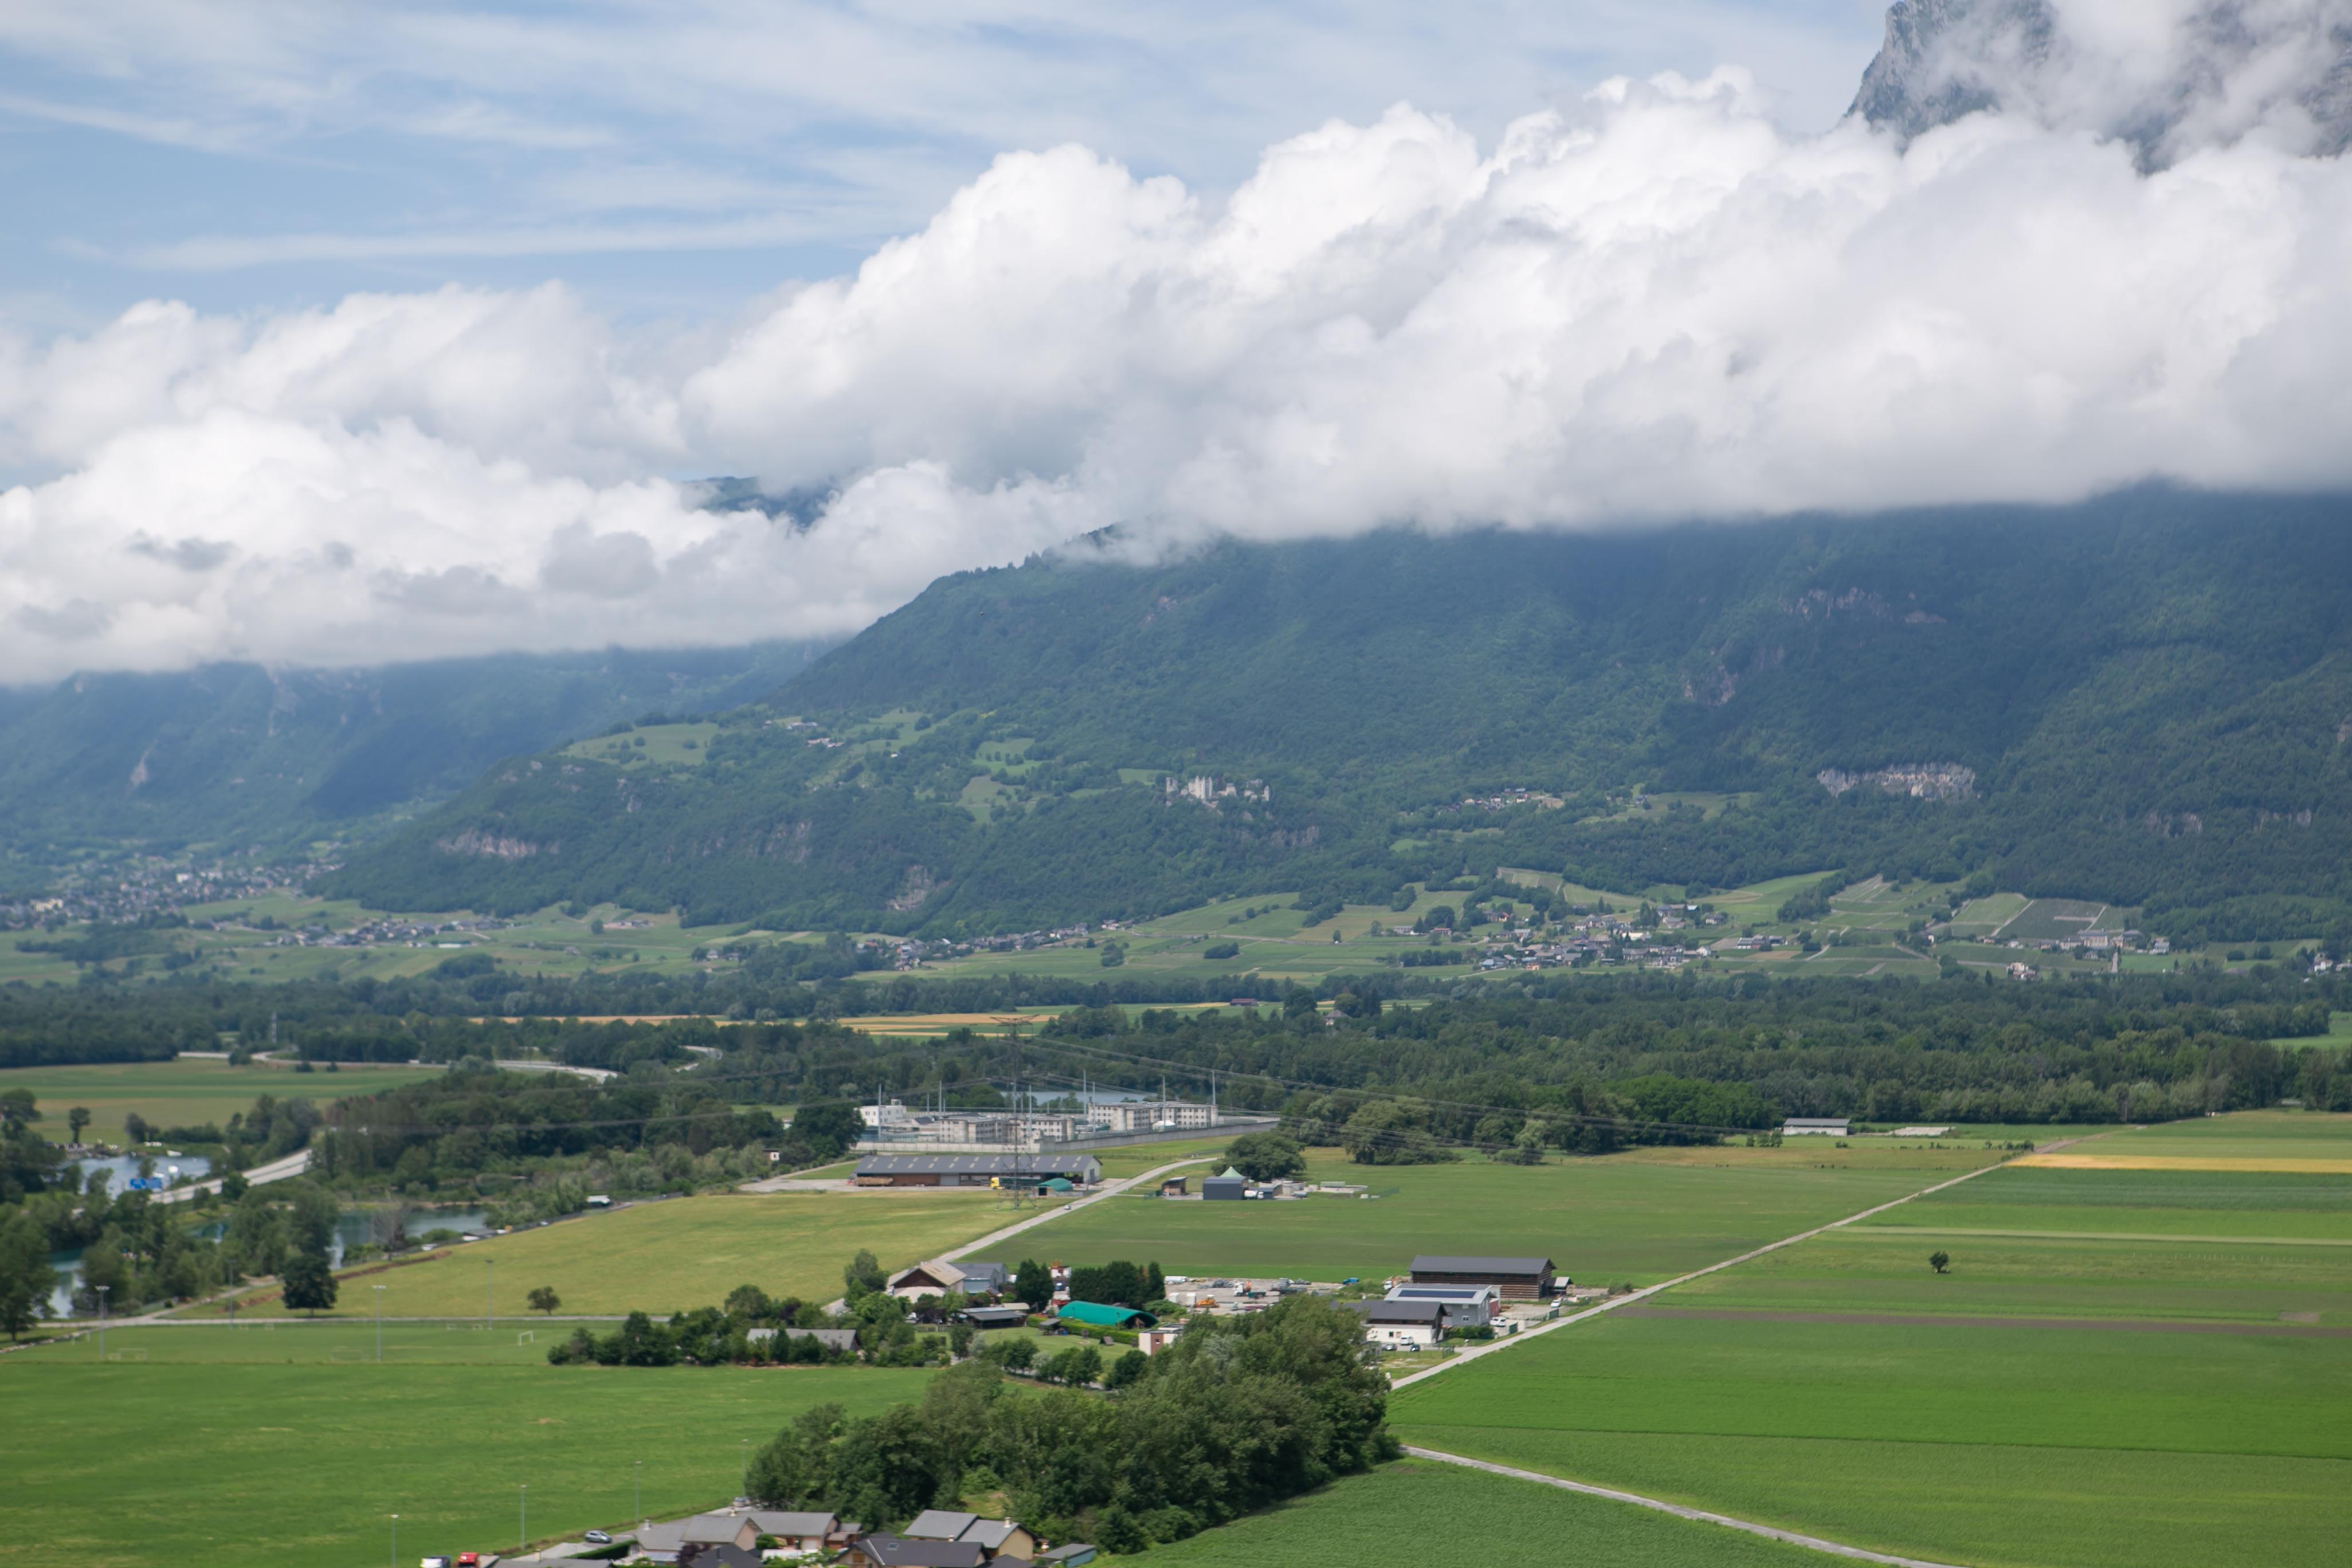 File:Aiton 2019 06 15 IMG 0069.jpg Wikimedia Commons